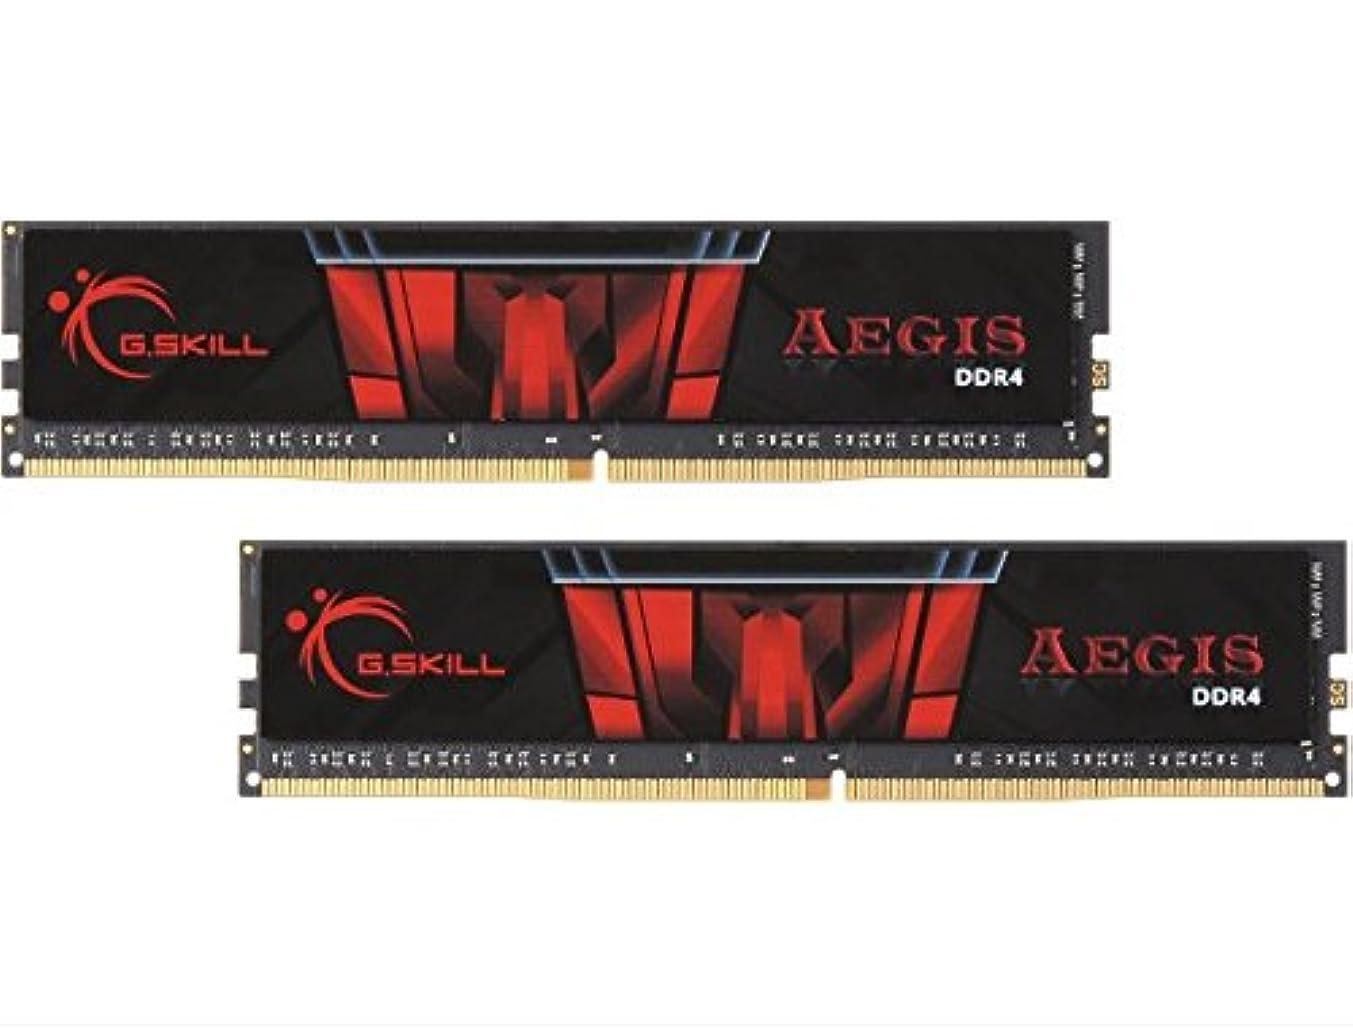 G.SKILL 8GB (2 x 4GB) Aegis DDR4 PC4-19200 2400MHz for Intel X299 / Z270 / Z170 / X99 Platform Desktop Memory Model F4-2400C17D-8GIS